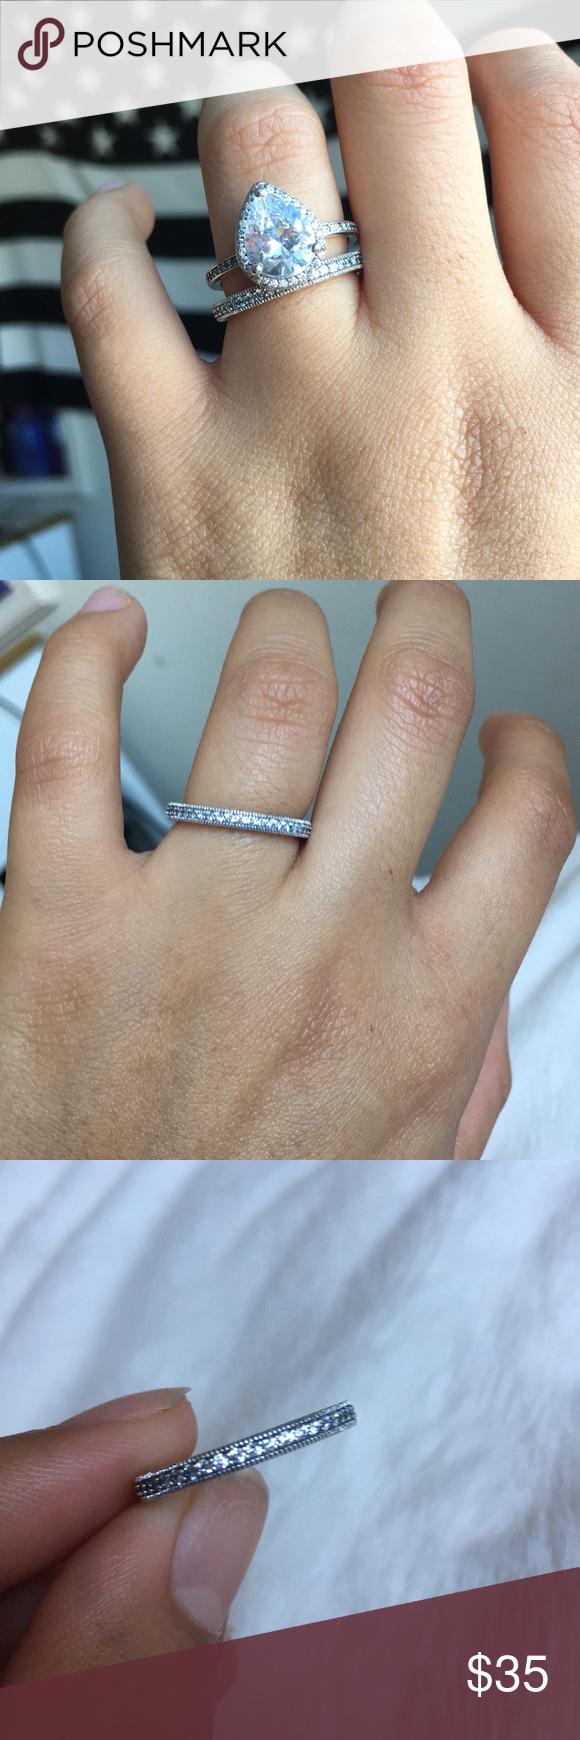 6928d2e5c ... best price 08 authentic pandora spacer ring pandora collection  authentic pandora ring size 08 spacer ring ...